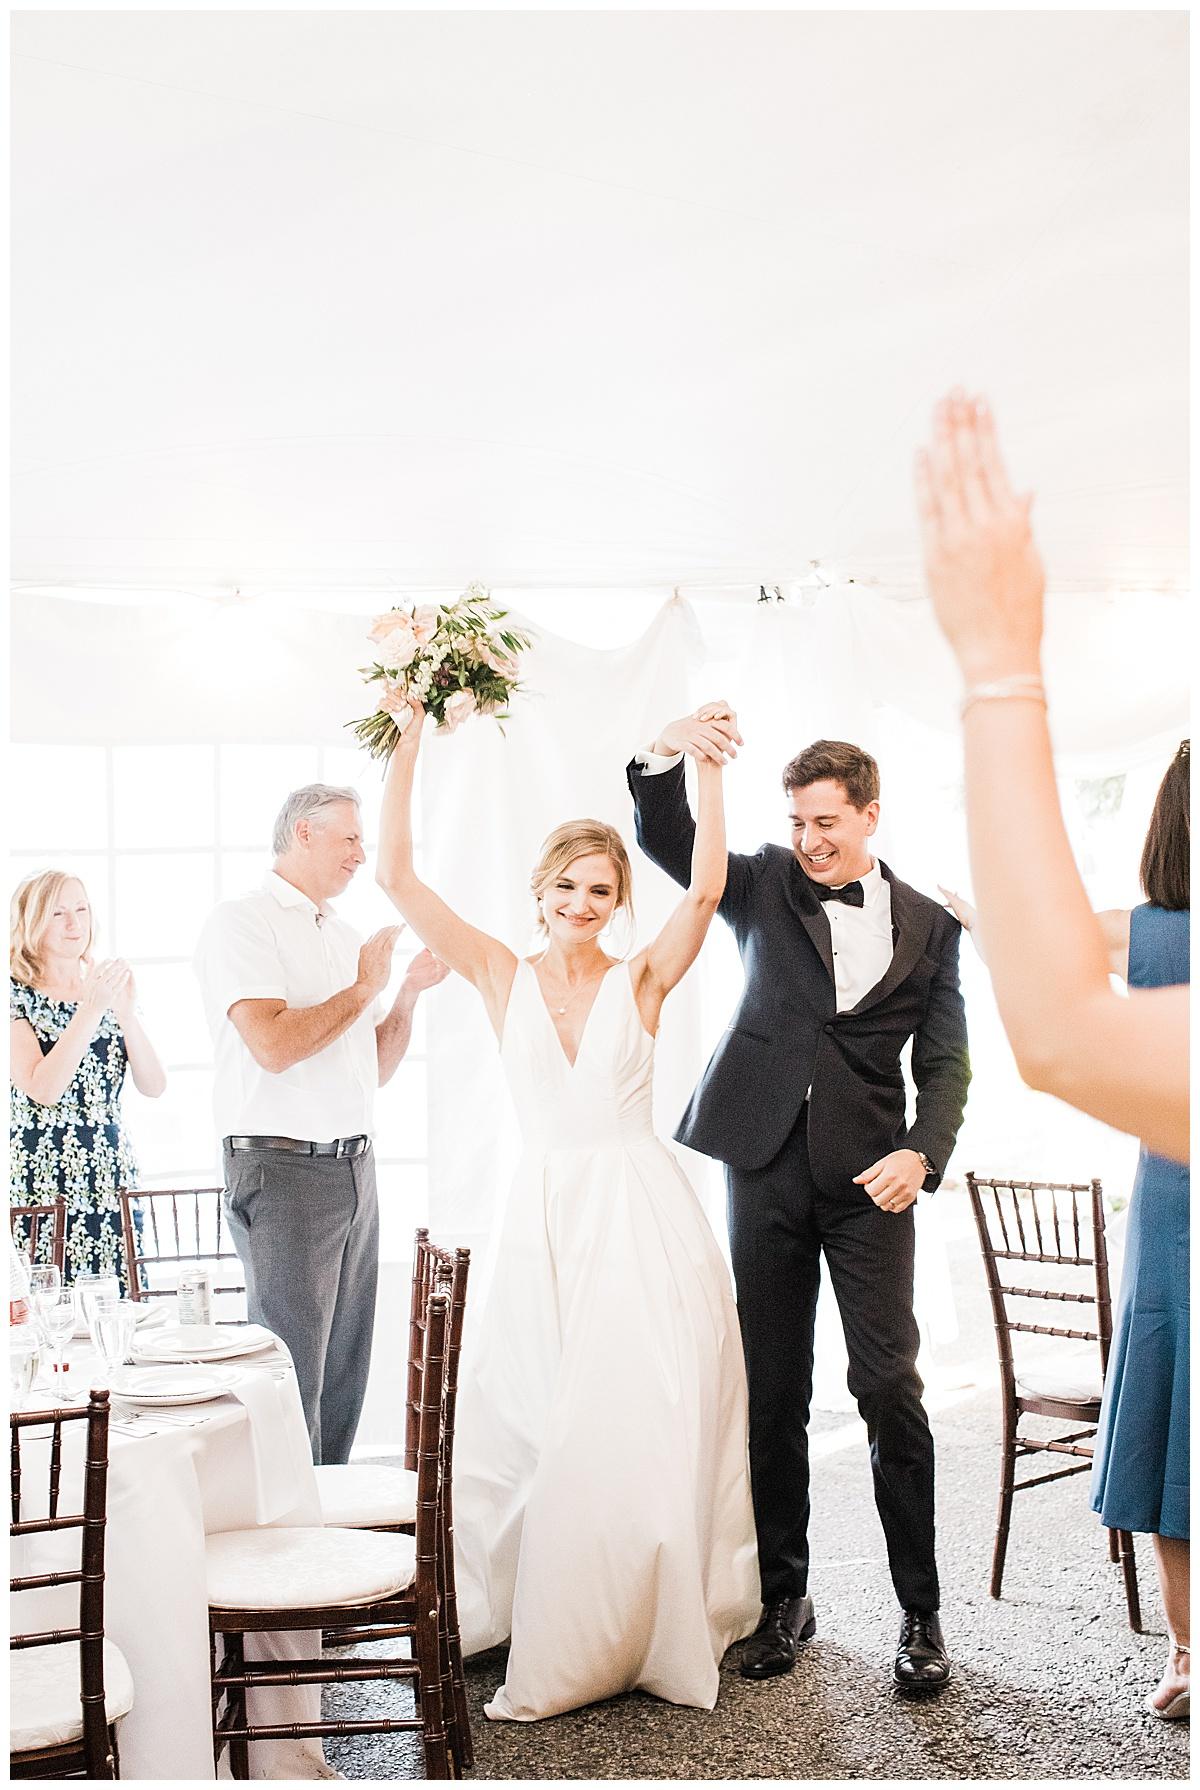 Bride and groom grand entrance| Toronto wedding photographer| 3photography